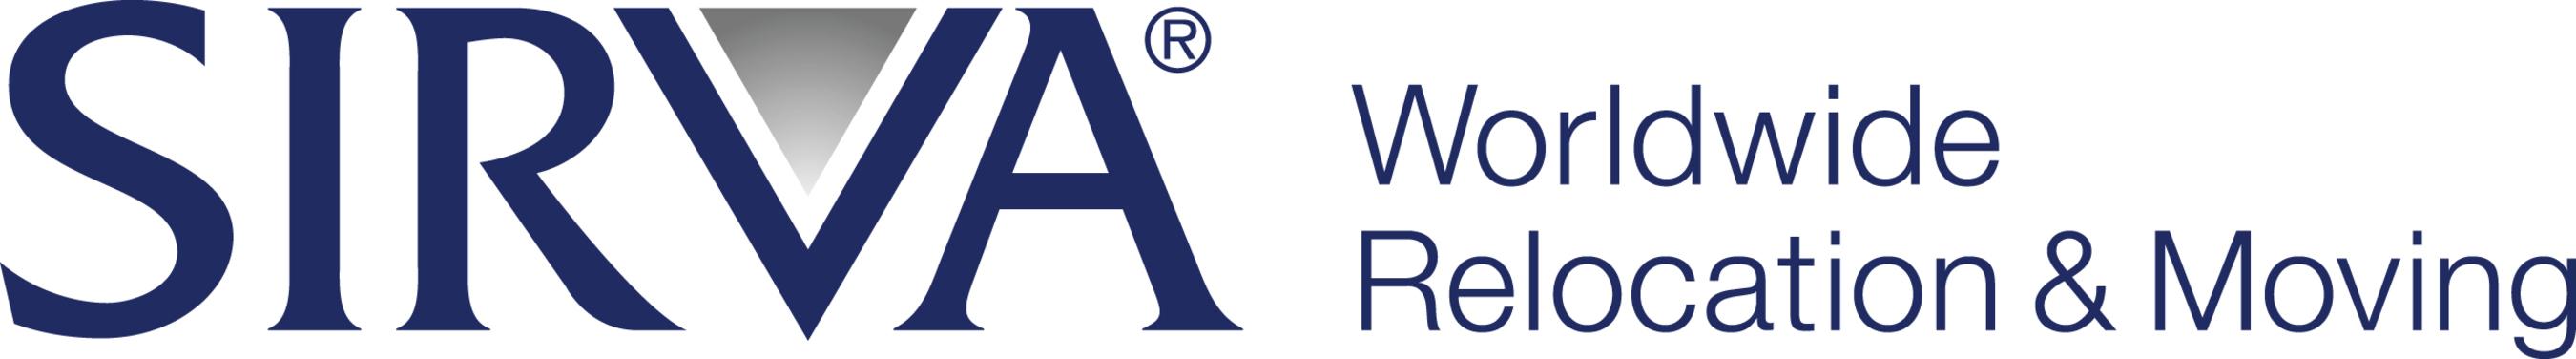 SIRVA Worldwide Relocation & Moving Logo